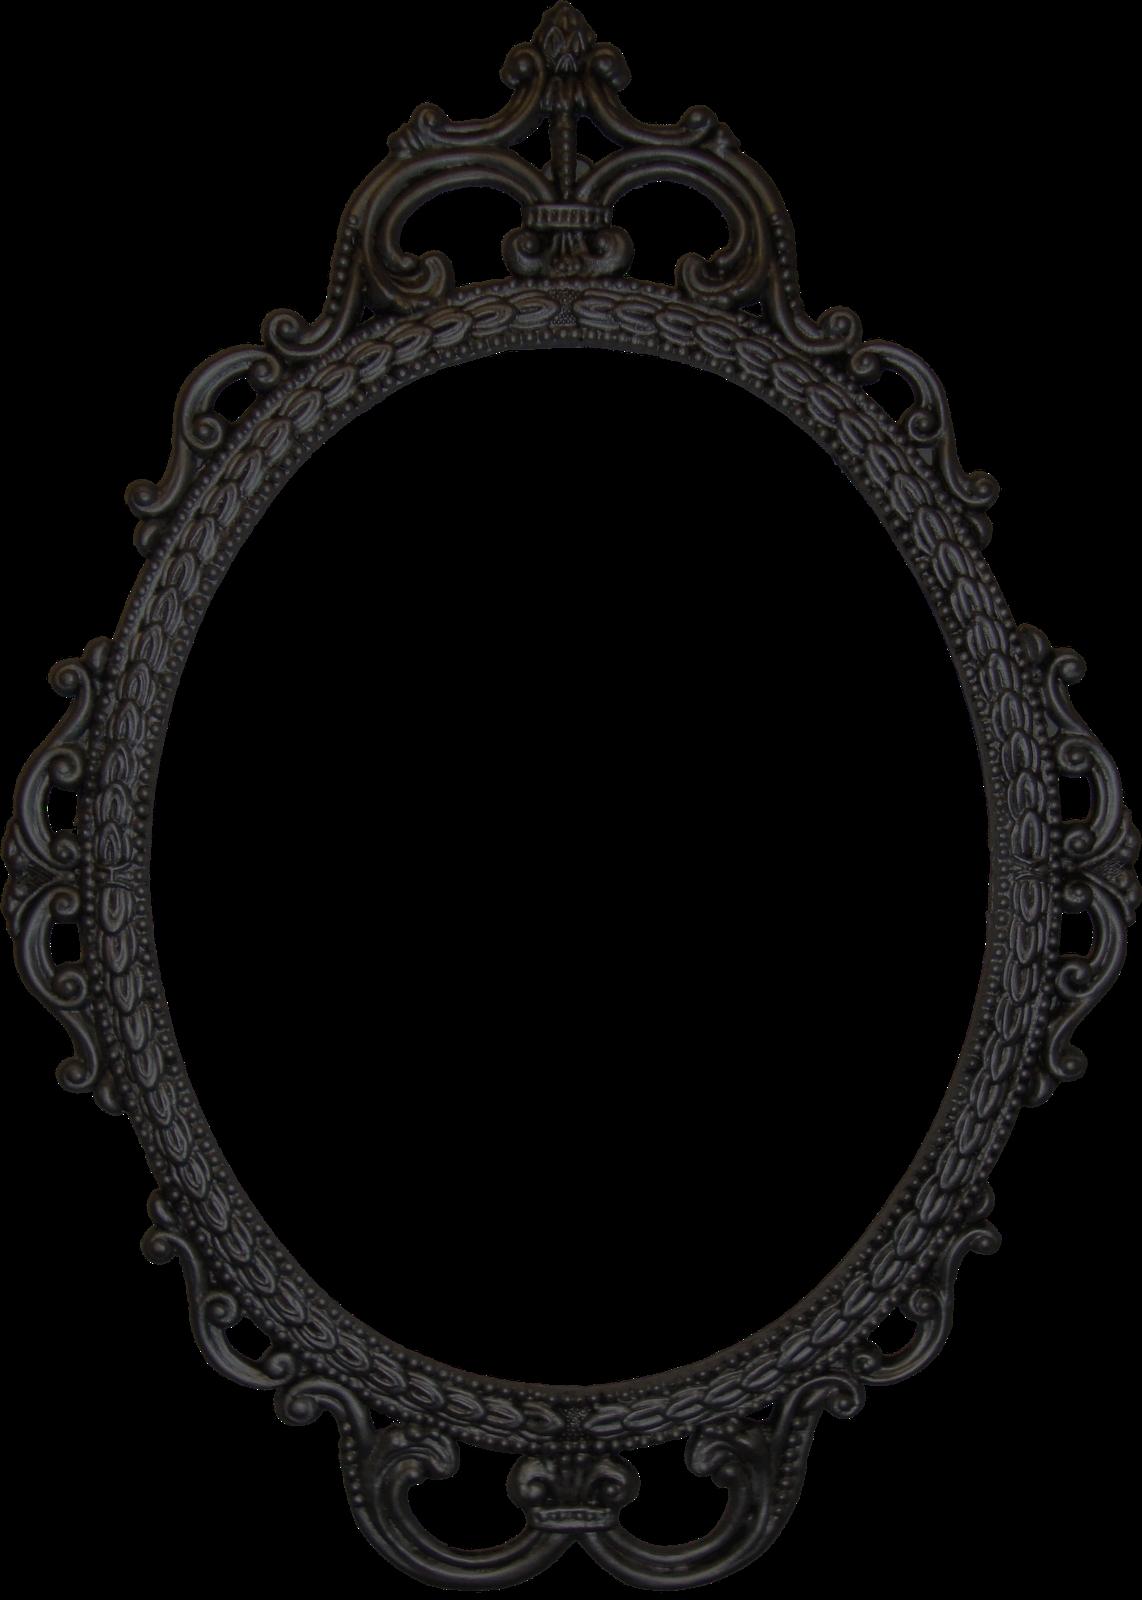 Doodle Craft Free Digital Antique Photo Frames Pictures Regarding Ornate Black Mirror (Image 6 of 15)